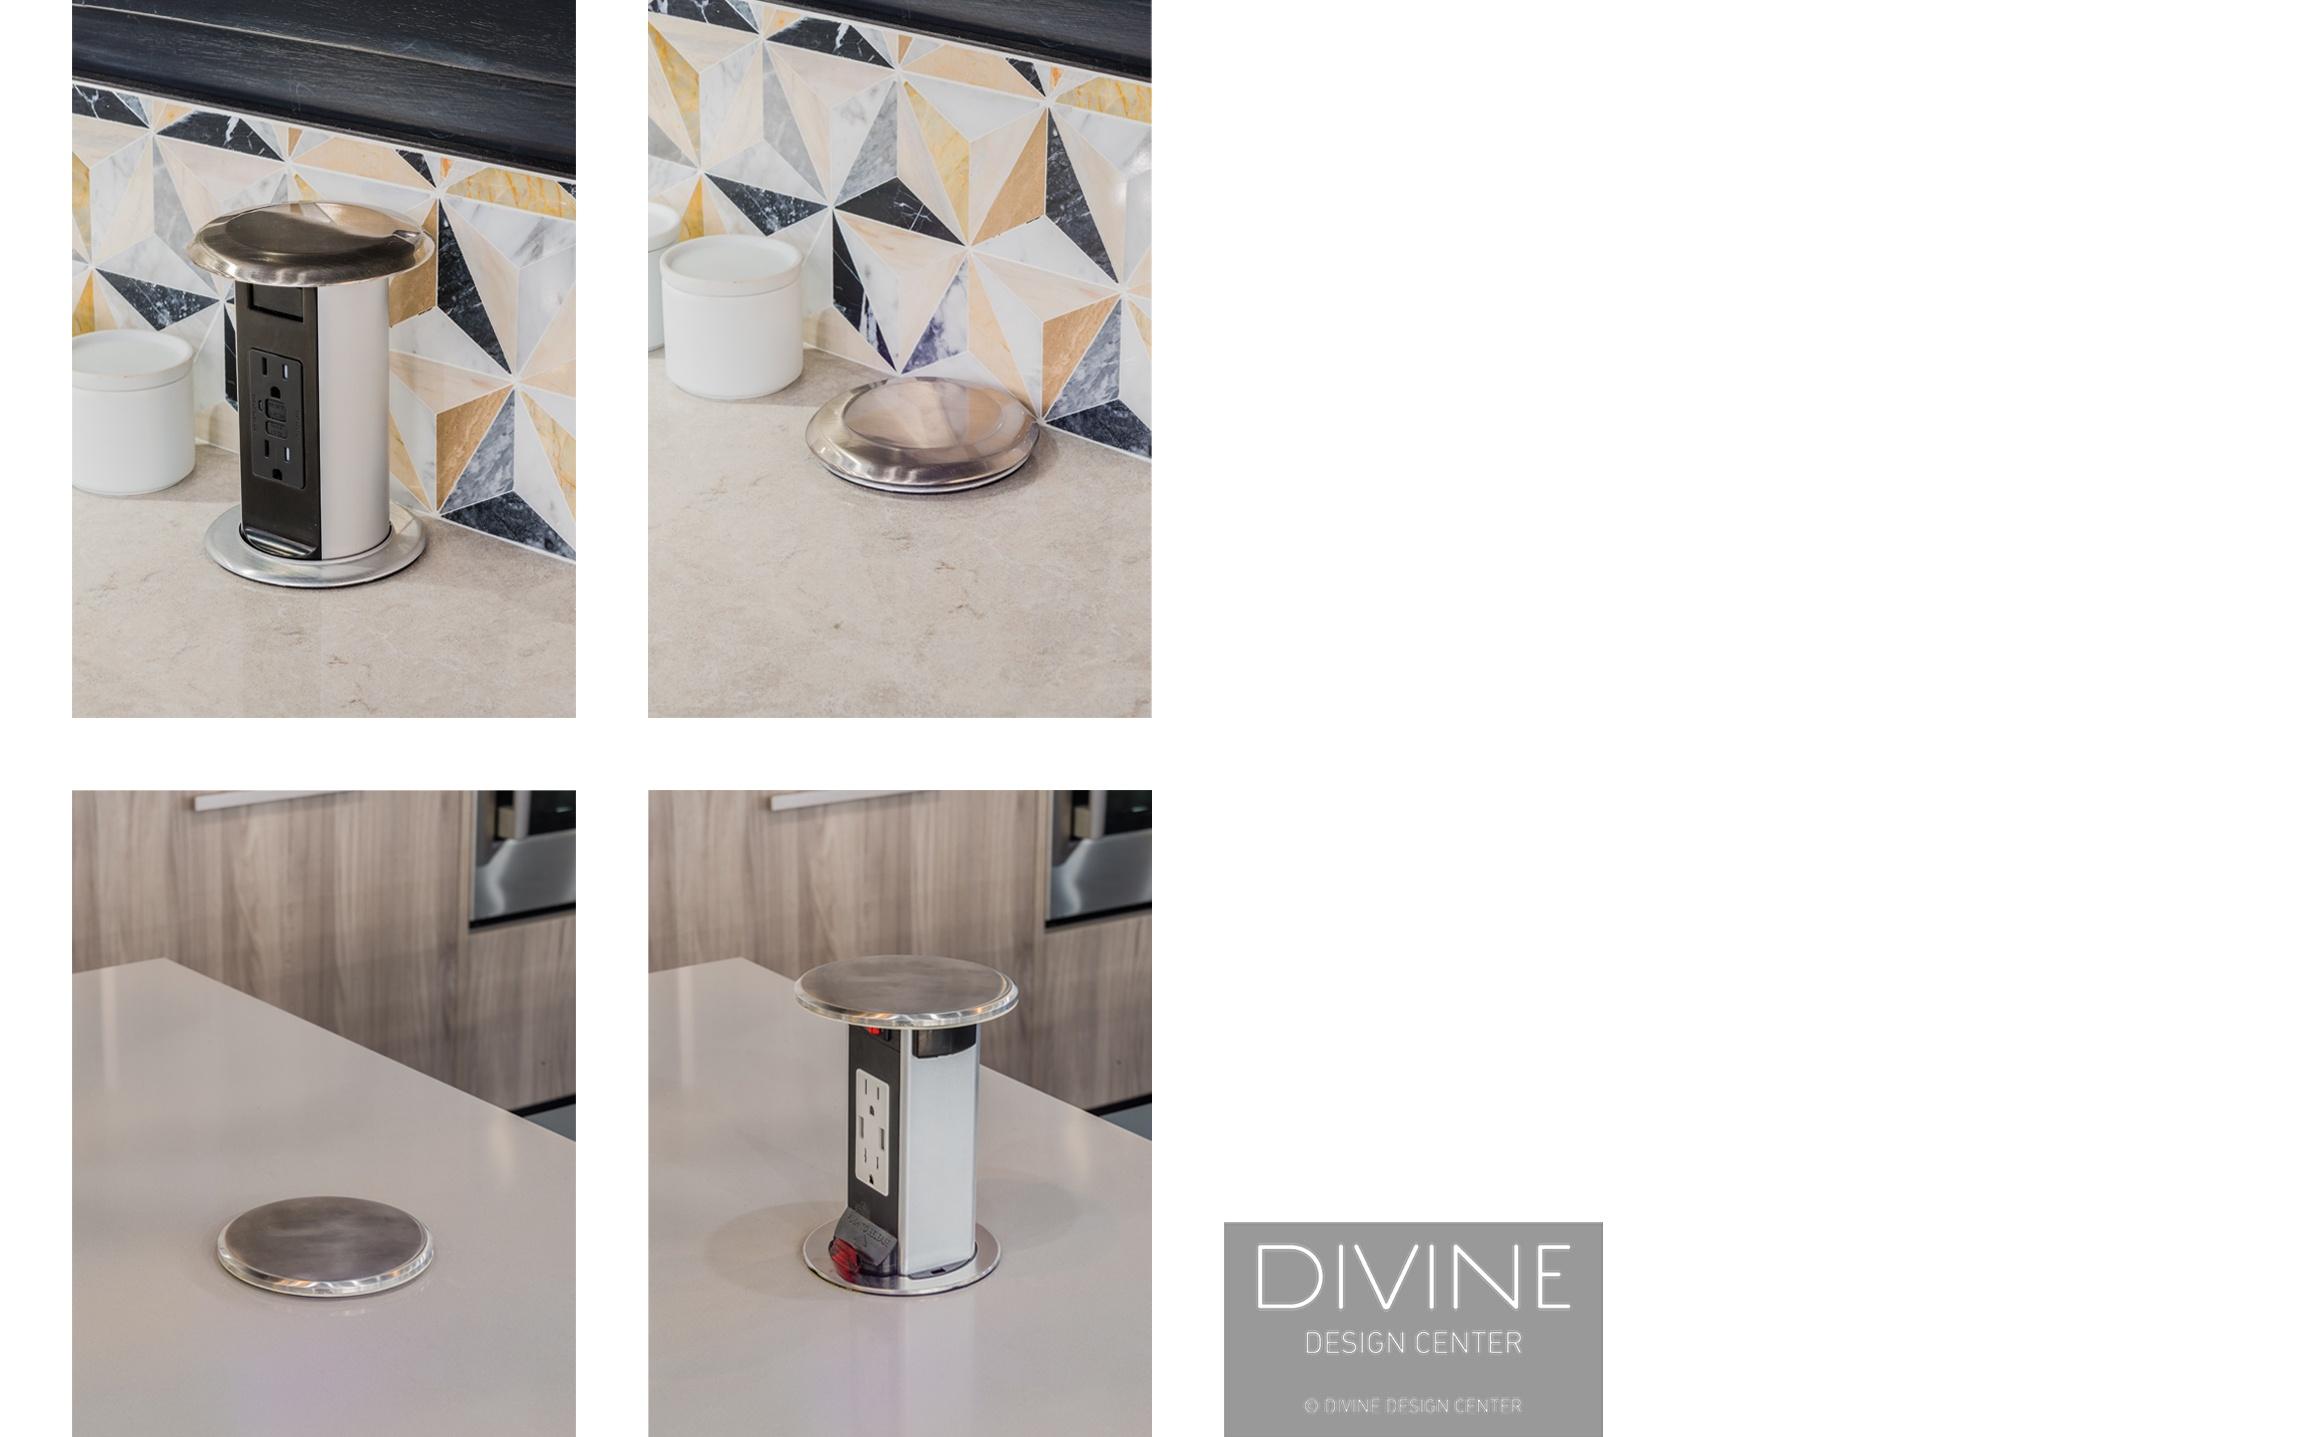 Lew Electric, Mockett, Boston, Massachusetts, kitchen, kitchen outlets, modern kitchen, discreet outlets, minimalist, tile back splash, pop-up, pop-out, pop up, pop out, quartzite, outlets in the countertop